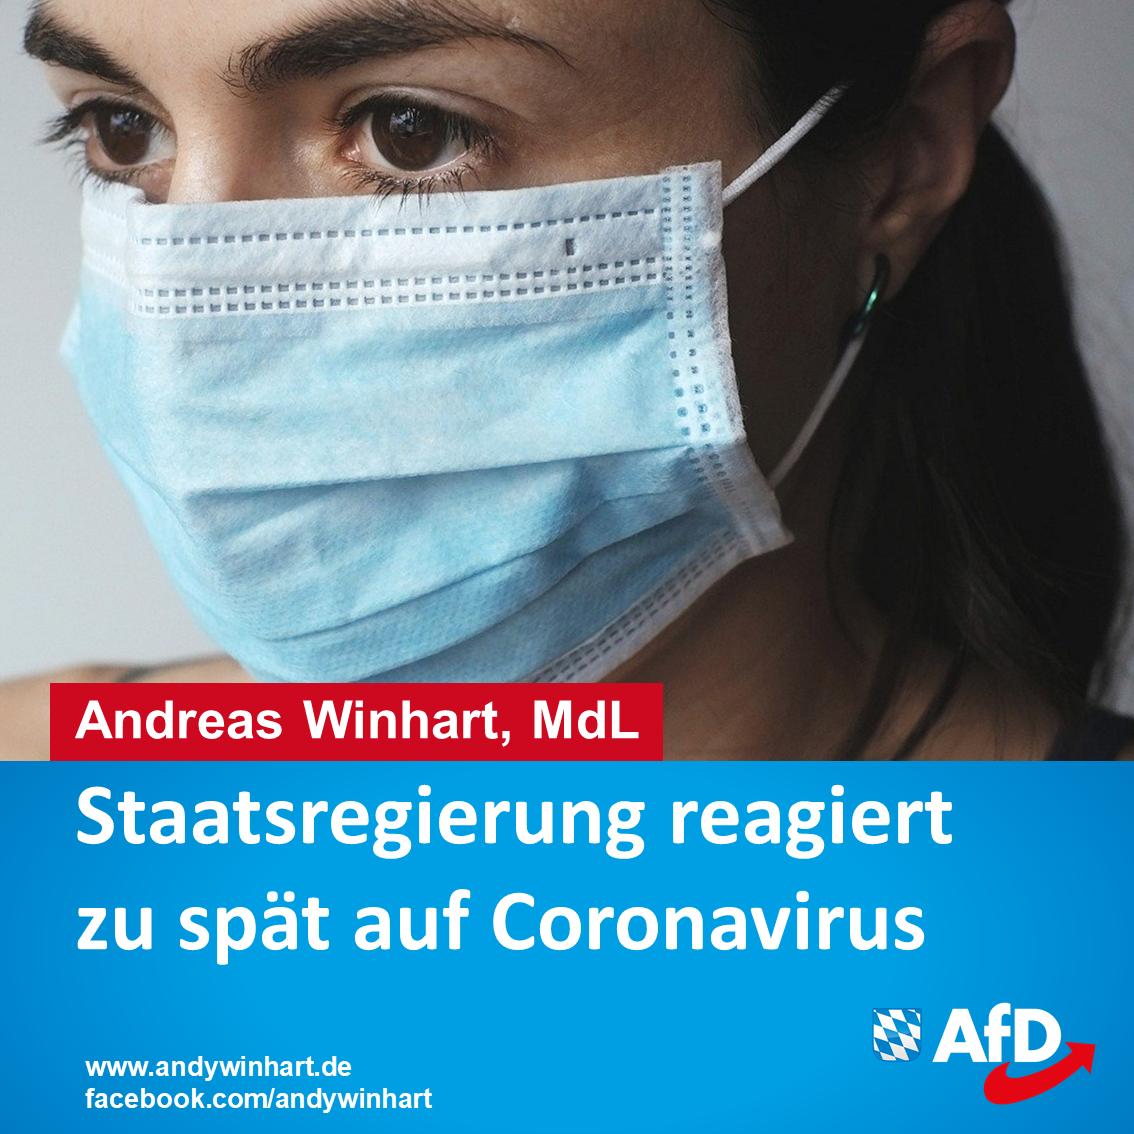 Staatsregierung reagiert zu spät auf Coronavirus